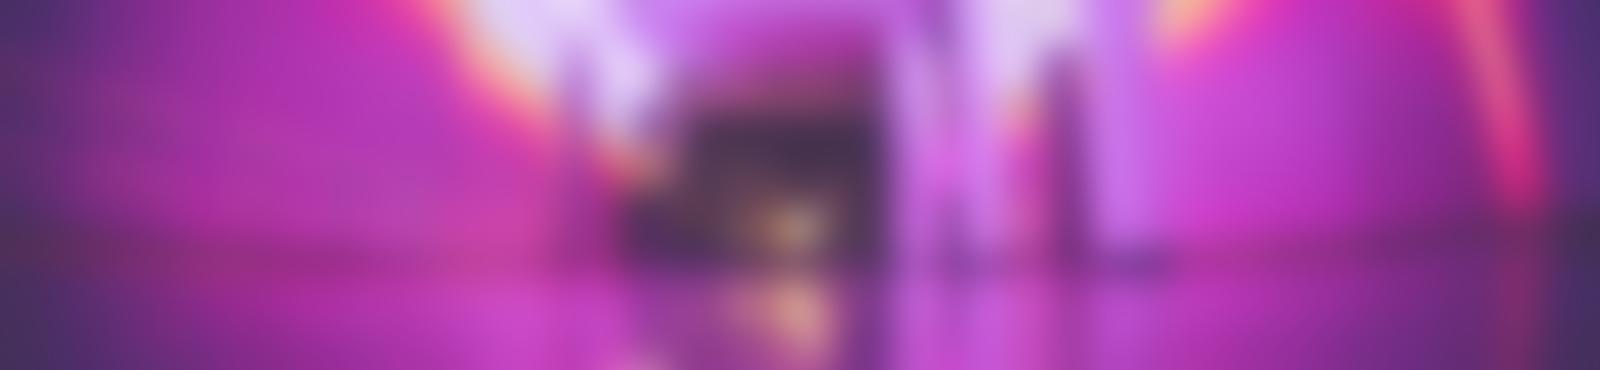 Blurred c3b17646 e9c1 4fb3 8c64 d9fc1672a456